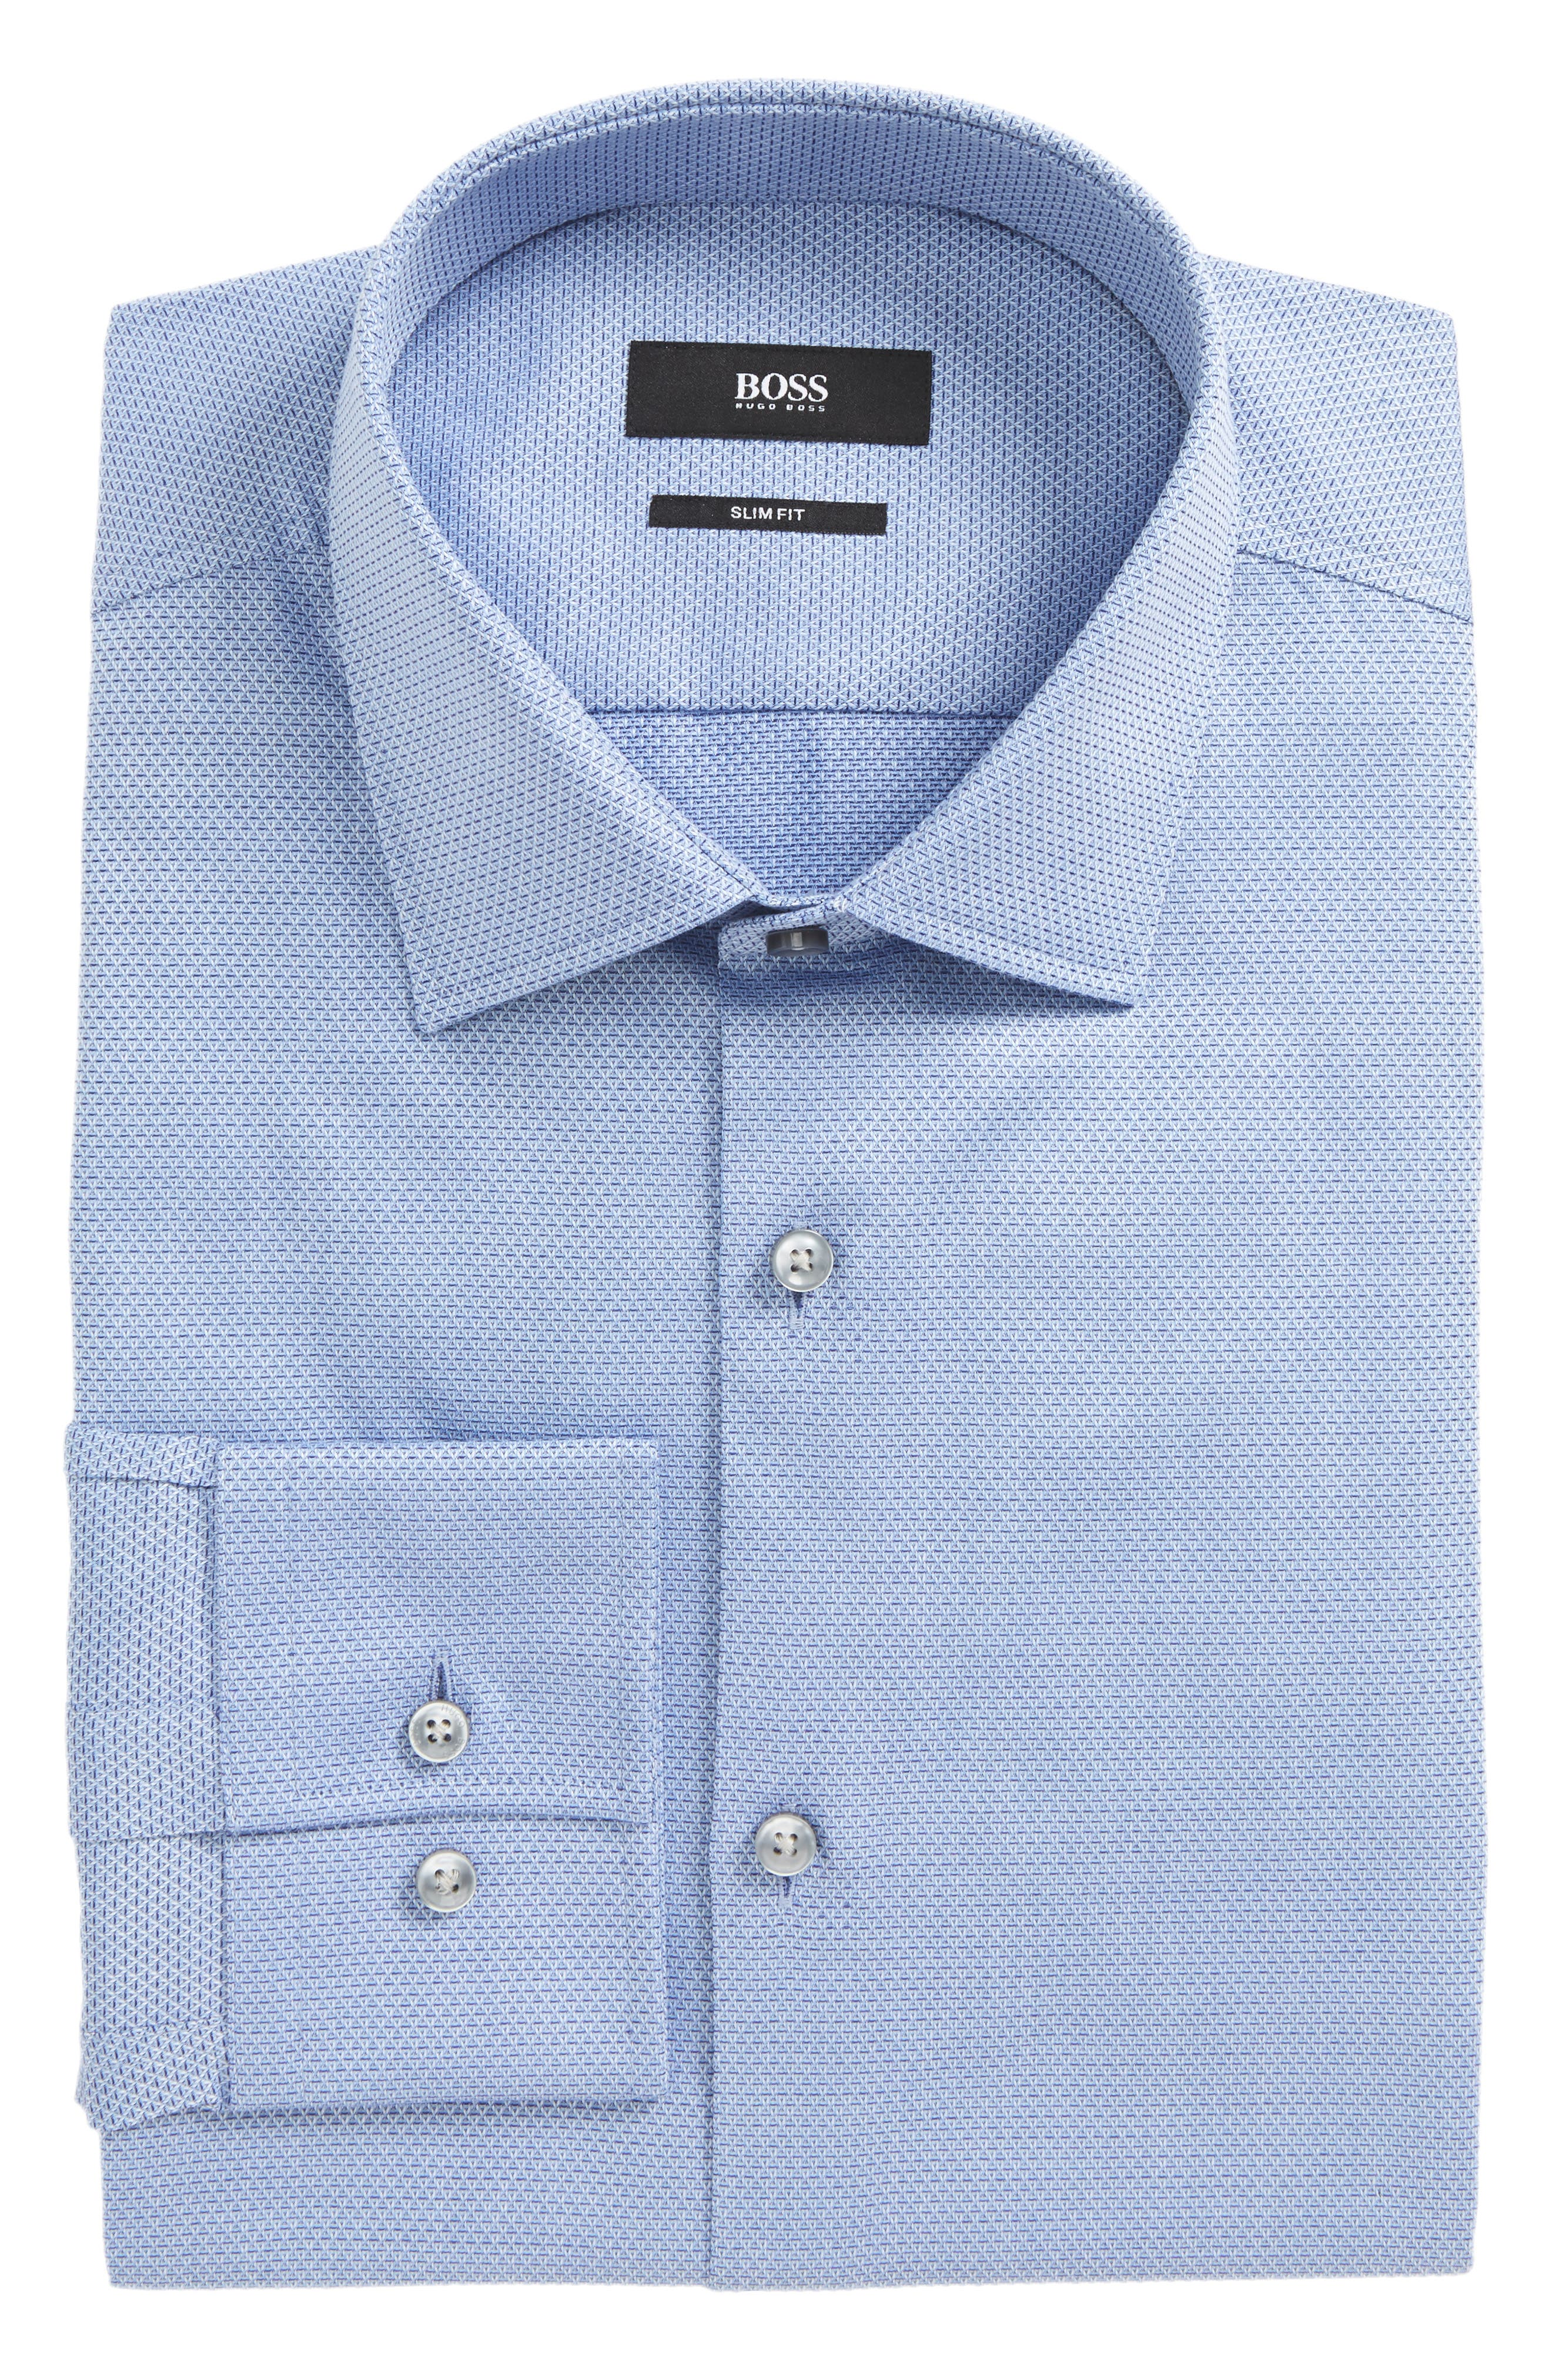 Jenno Slim Fit Textured Dress Shirt,                         Main,                         color,